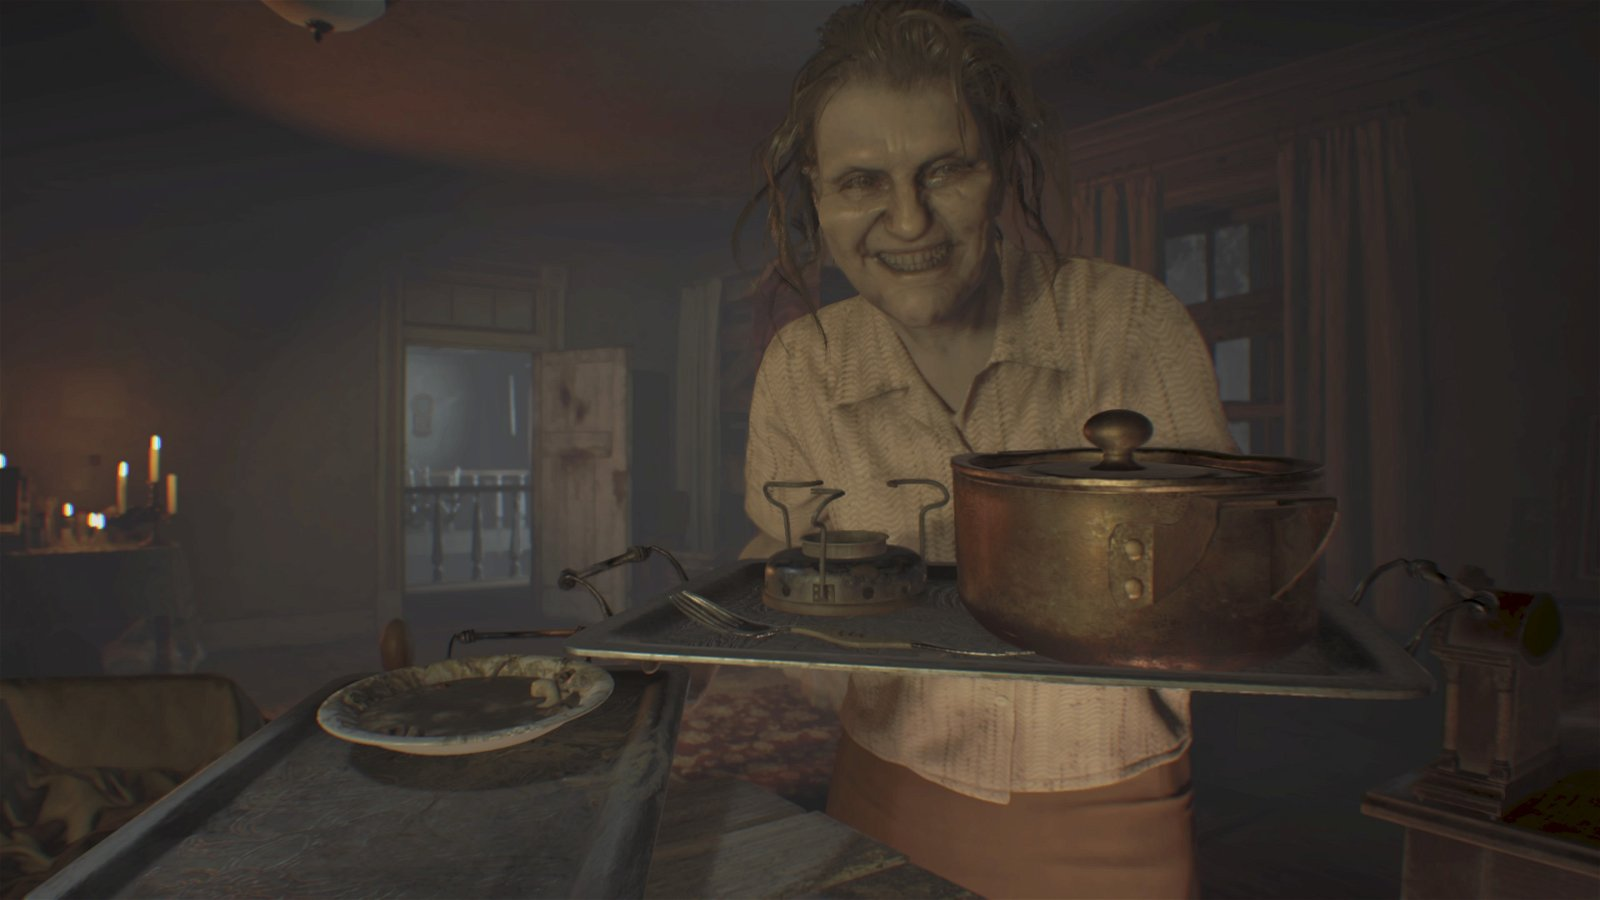 Resident Evil 7: Su DLC estaría basado en la novela Misery de Stephen King